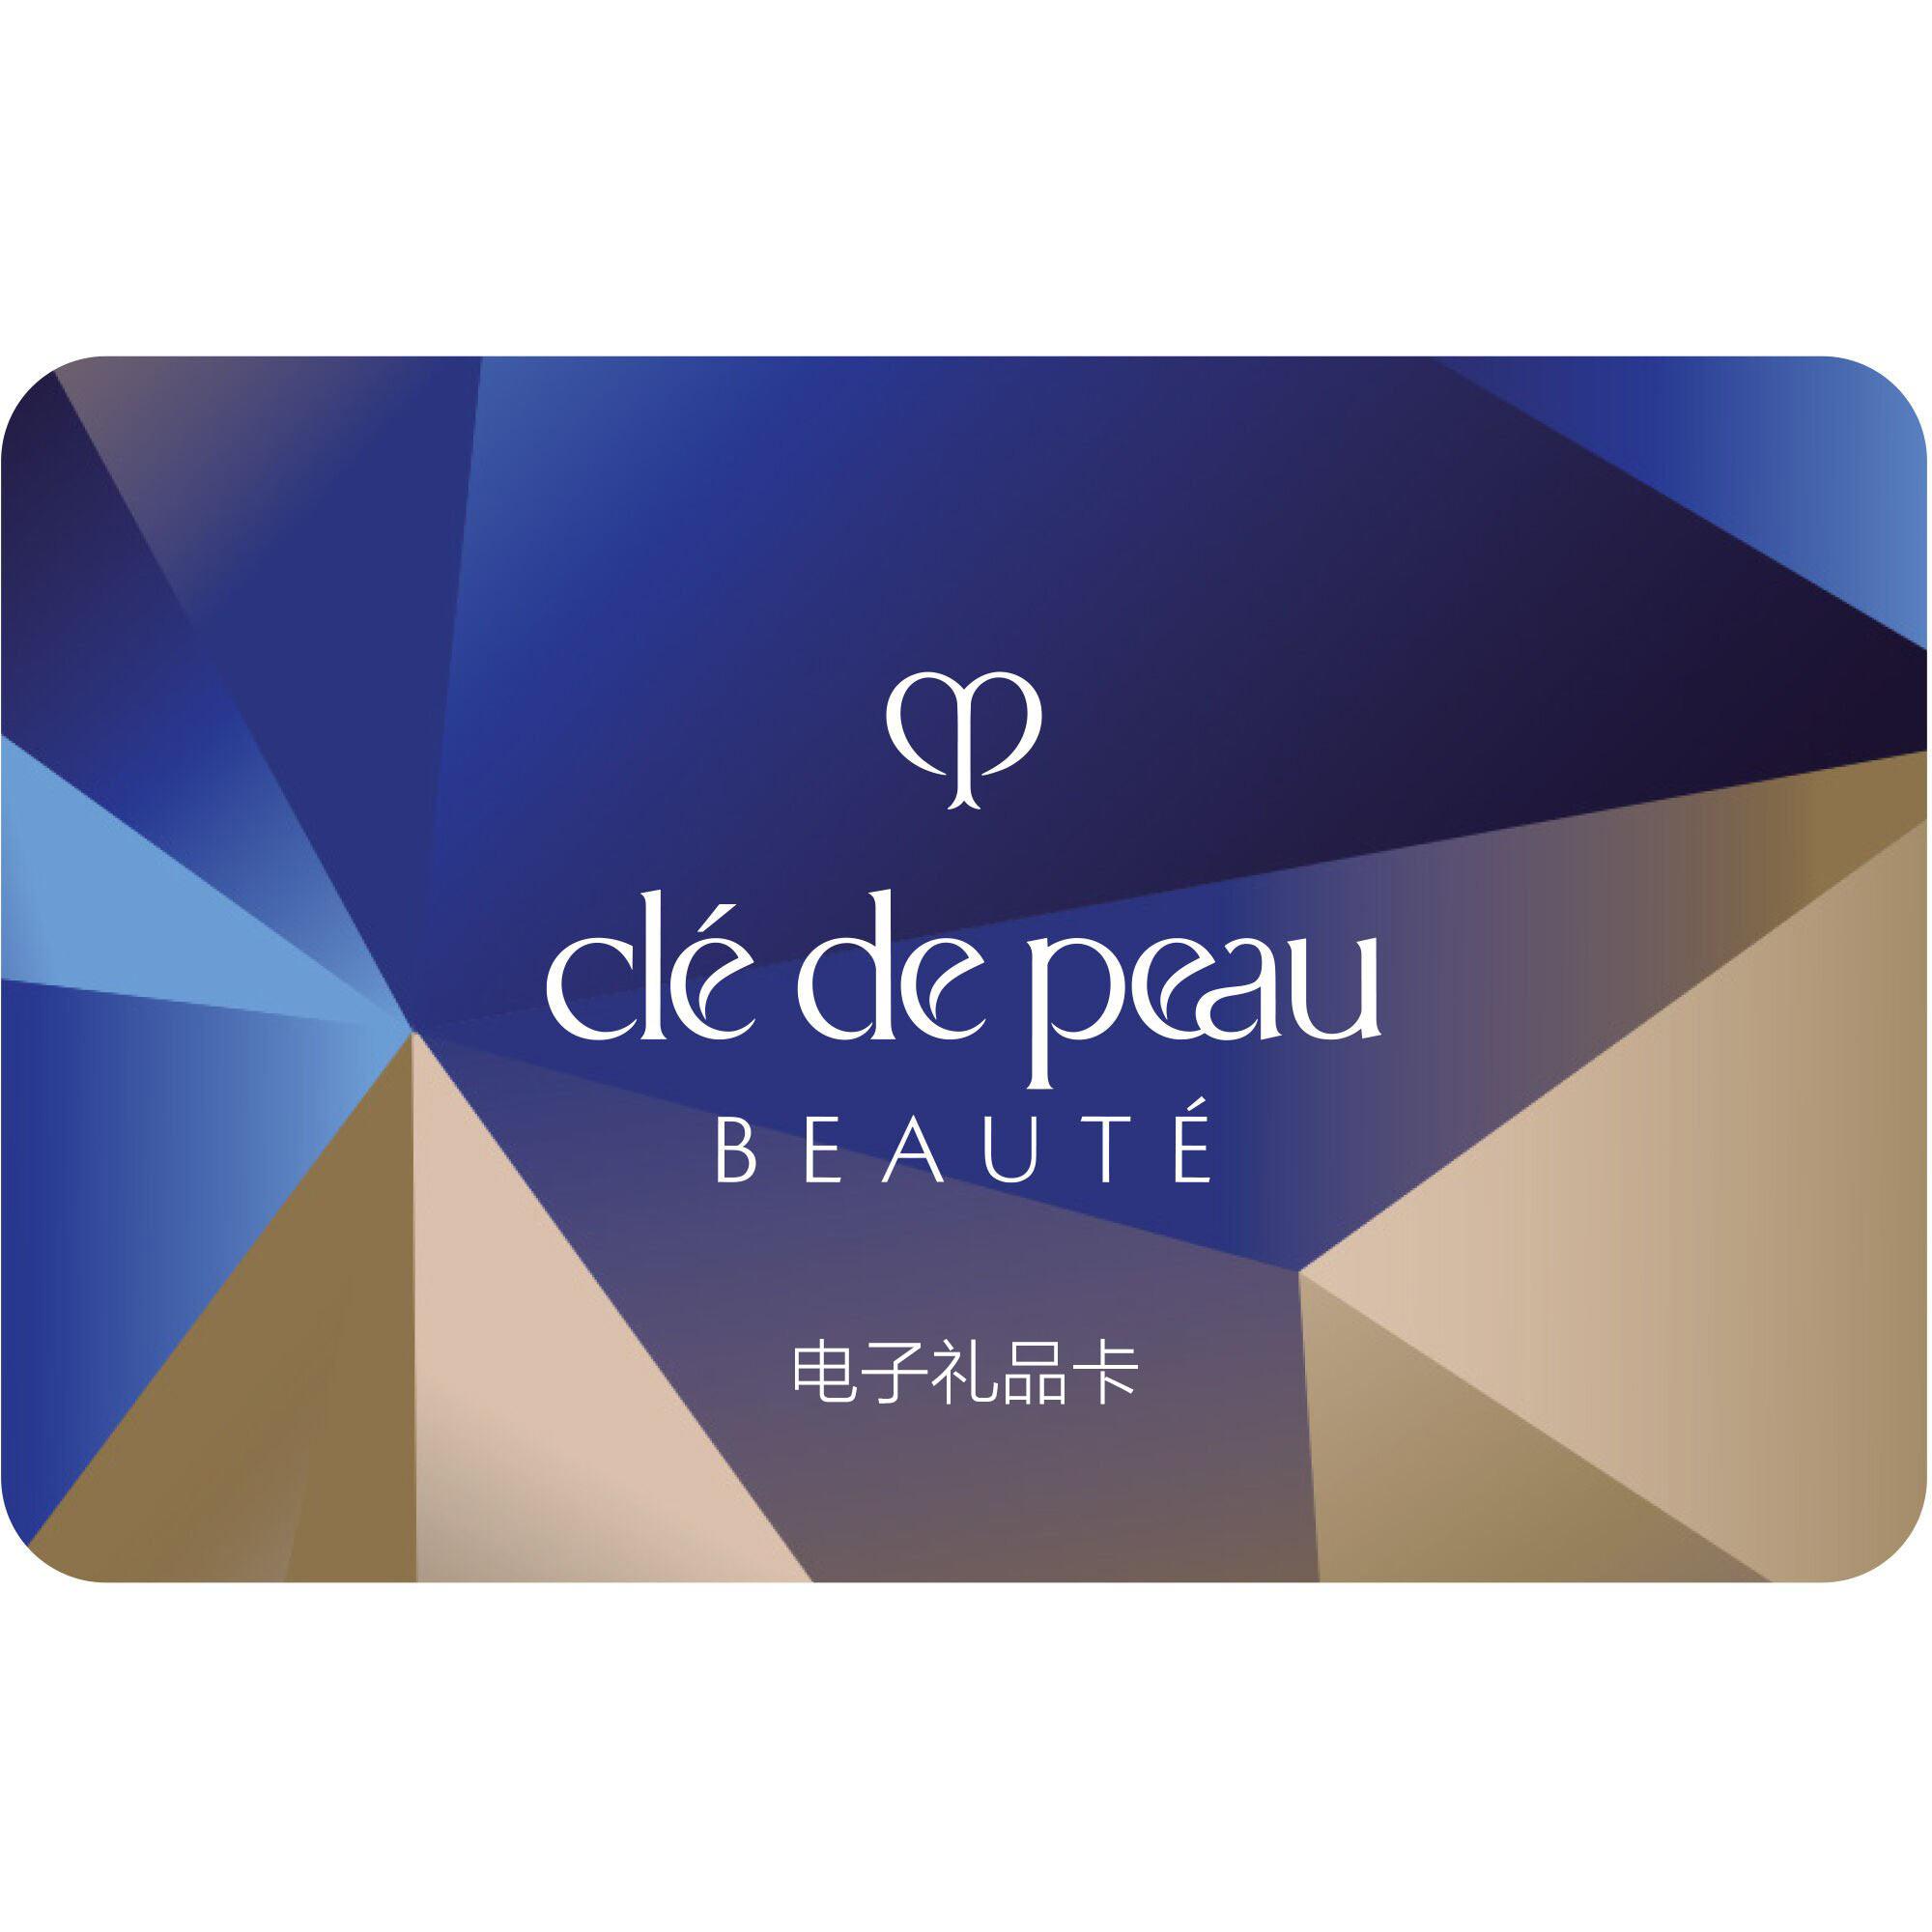 CPB eGift Card - 25美元质地的放大图片,